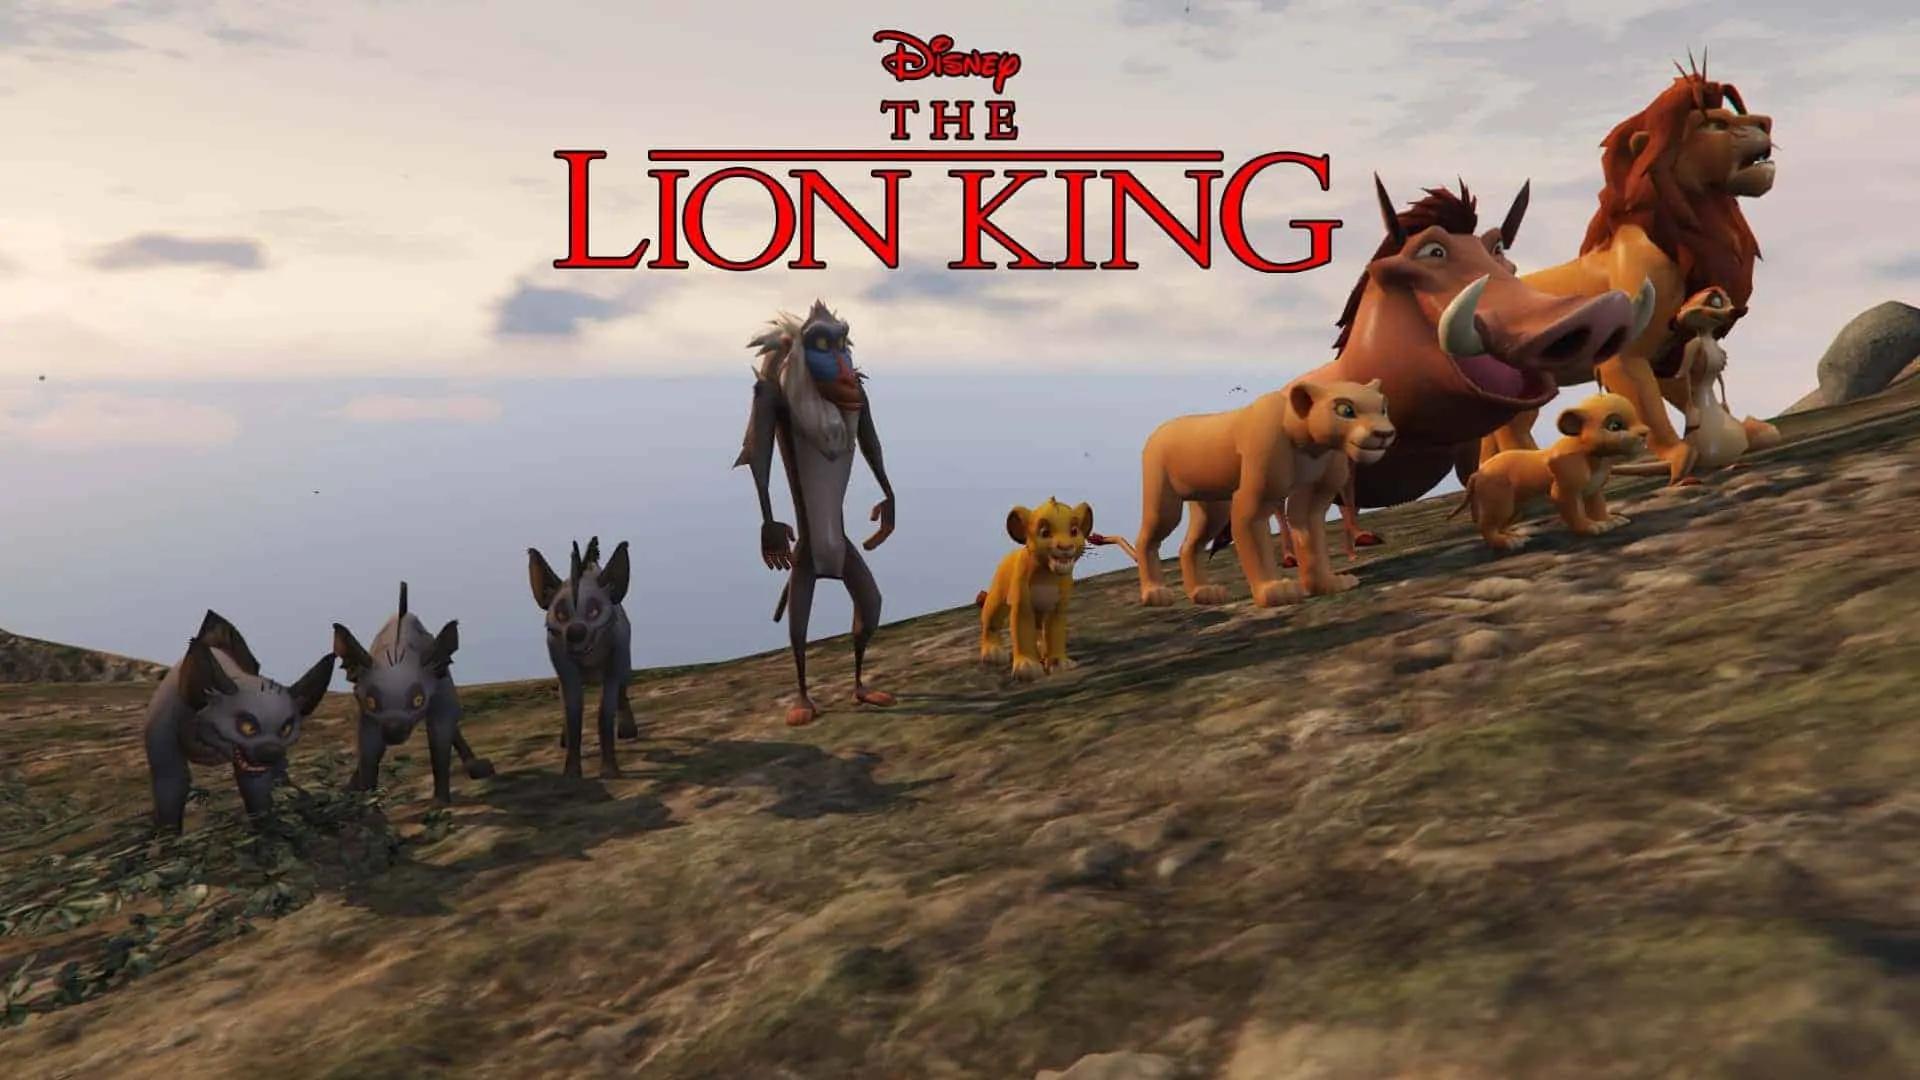 Gta 5 Stock Market Guide >> GTA 5 Meets The Lion King - GTA 5 Cheats